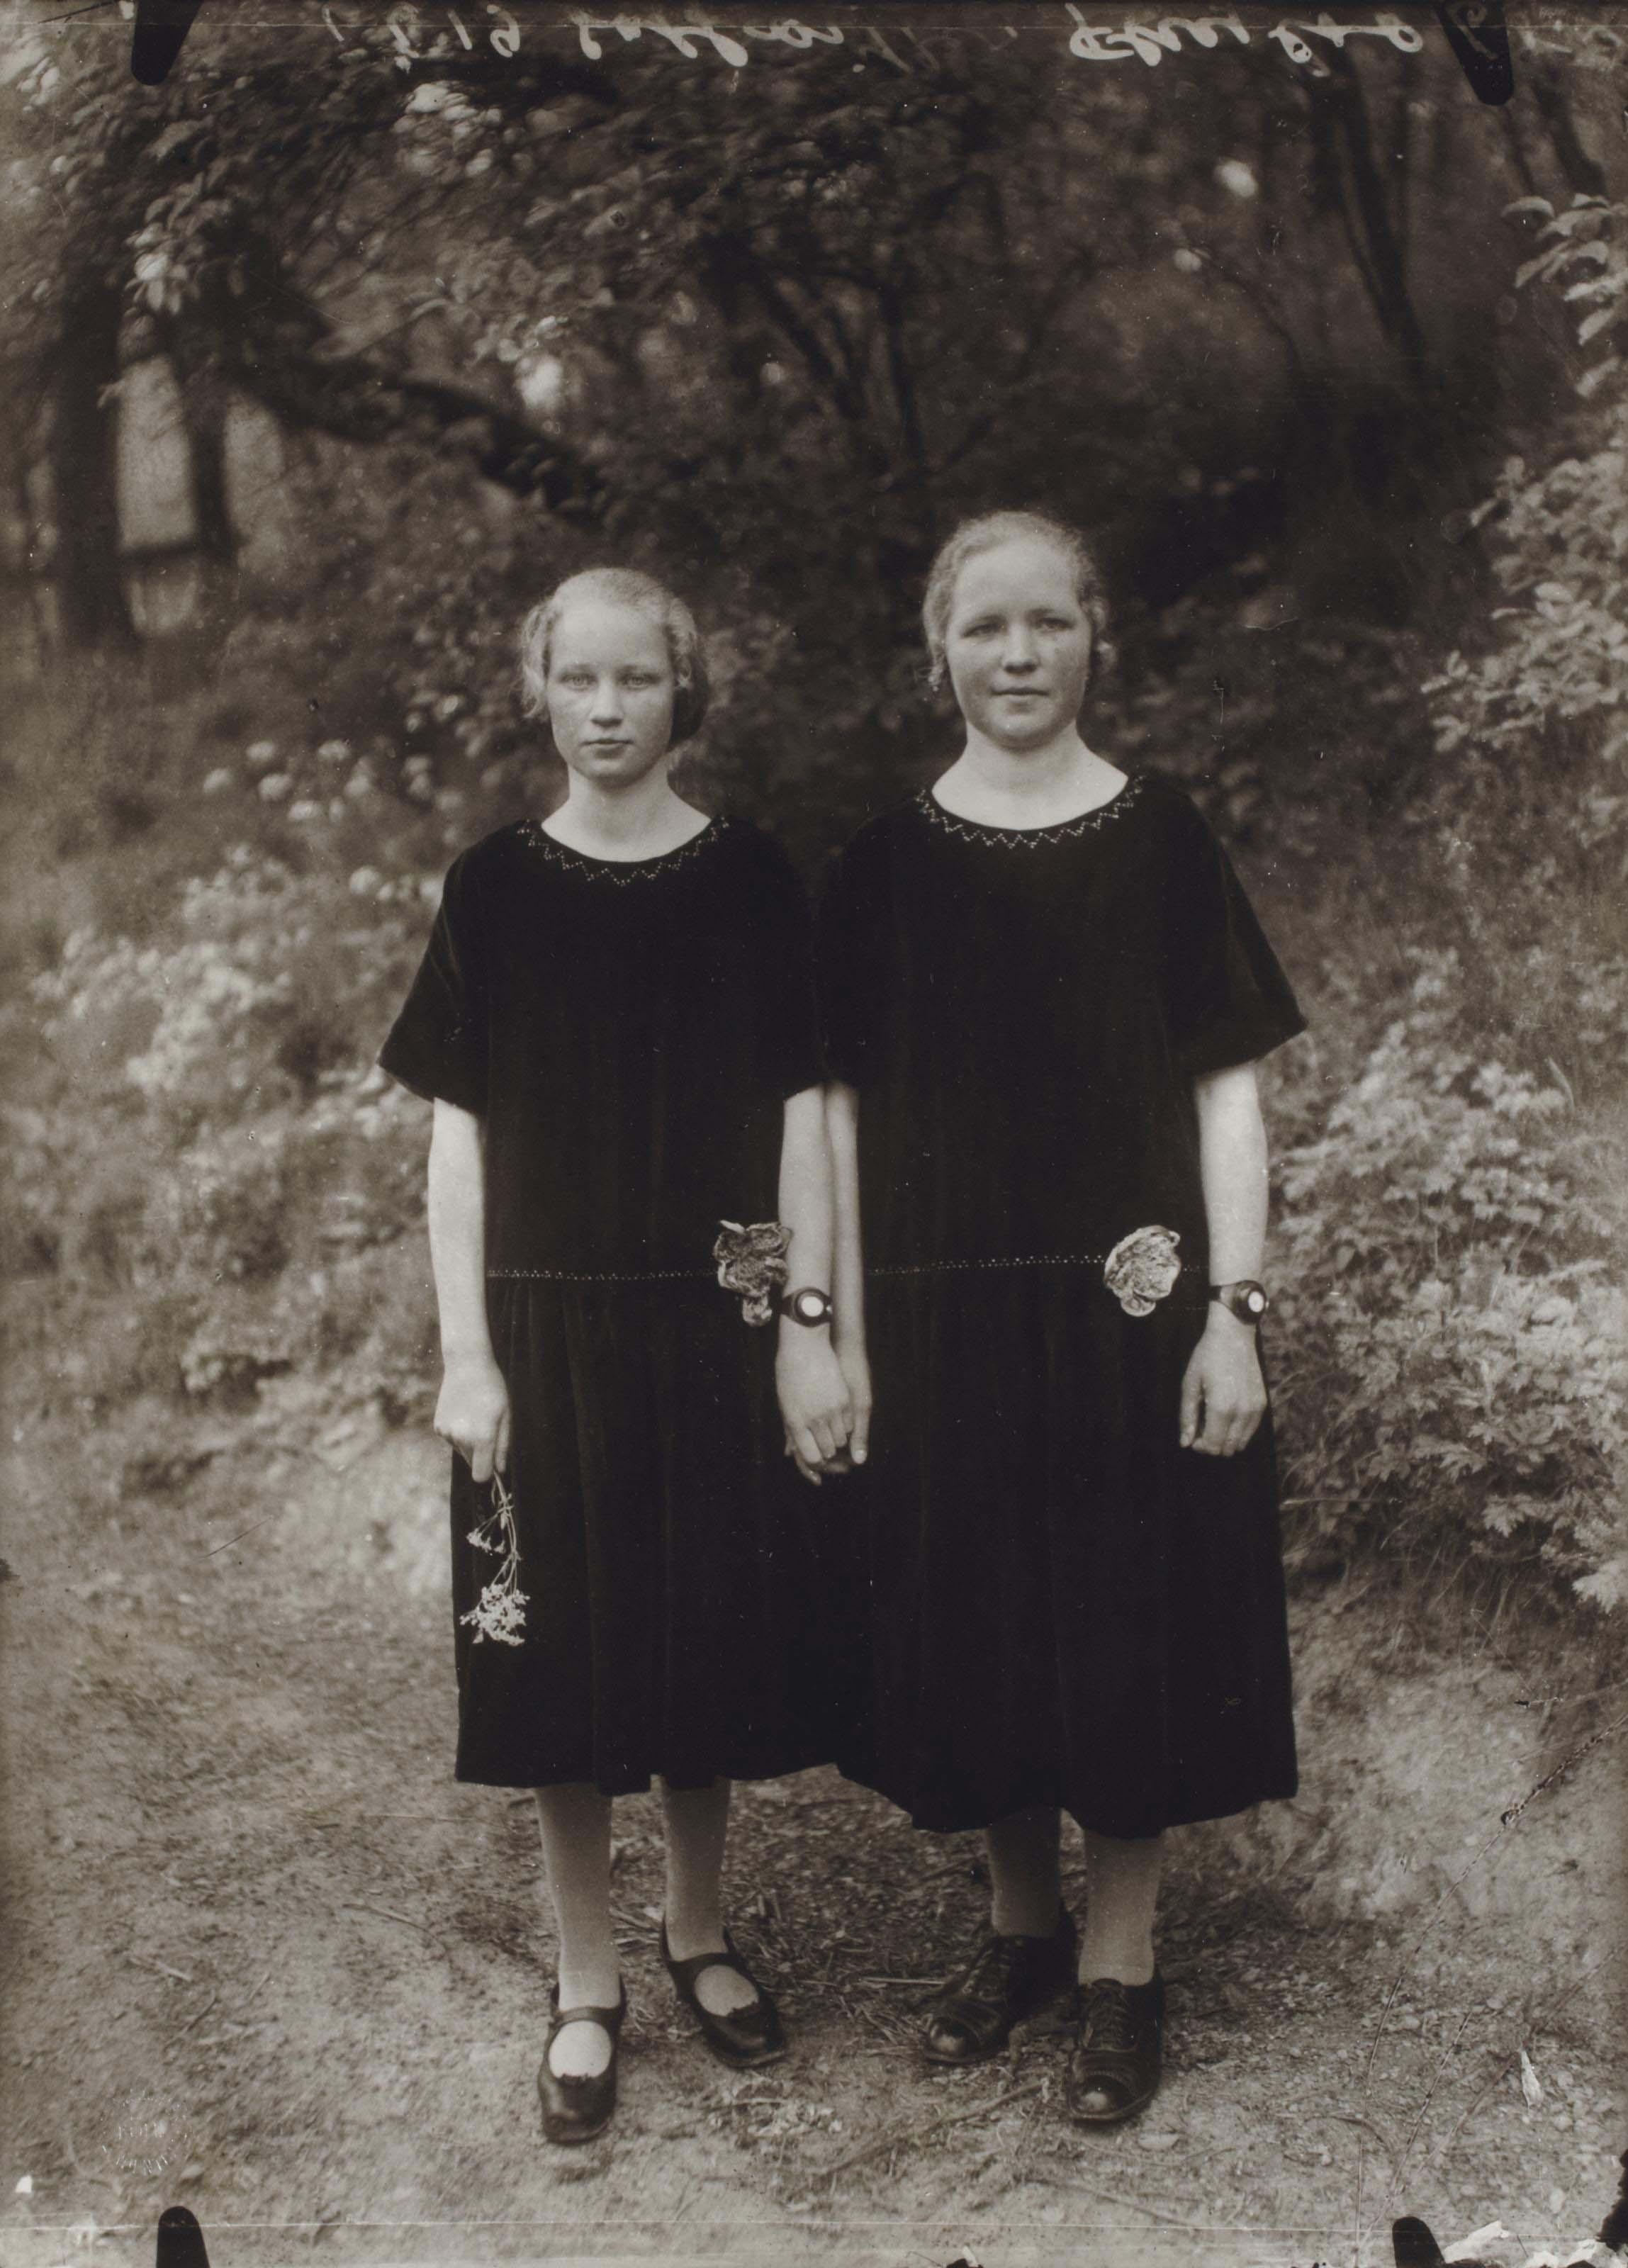 Country girls, 1925